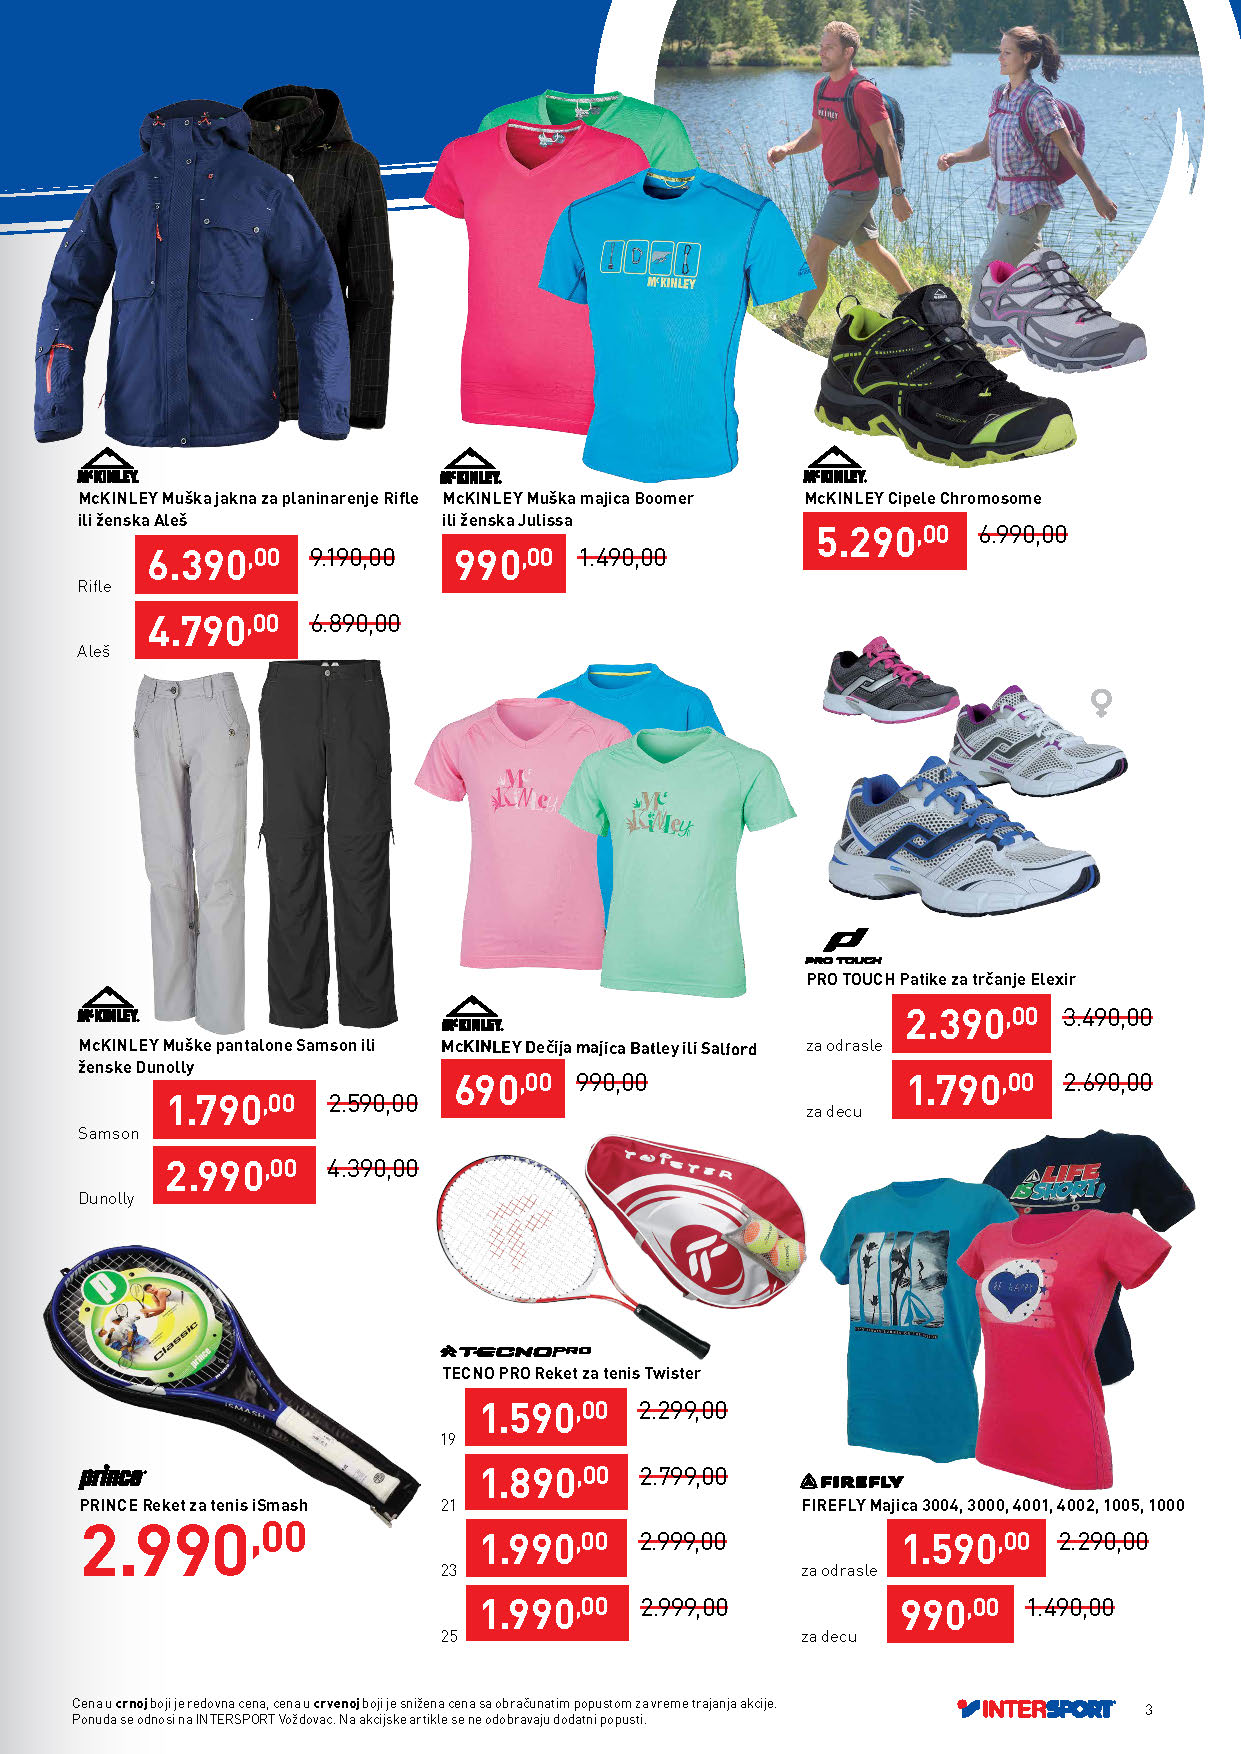 Intersport Katalog Sportska oprema